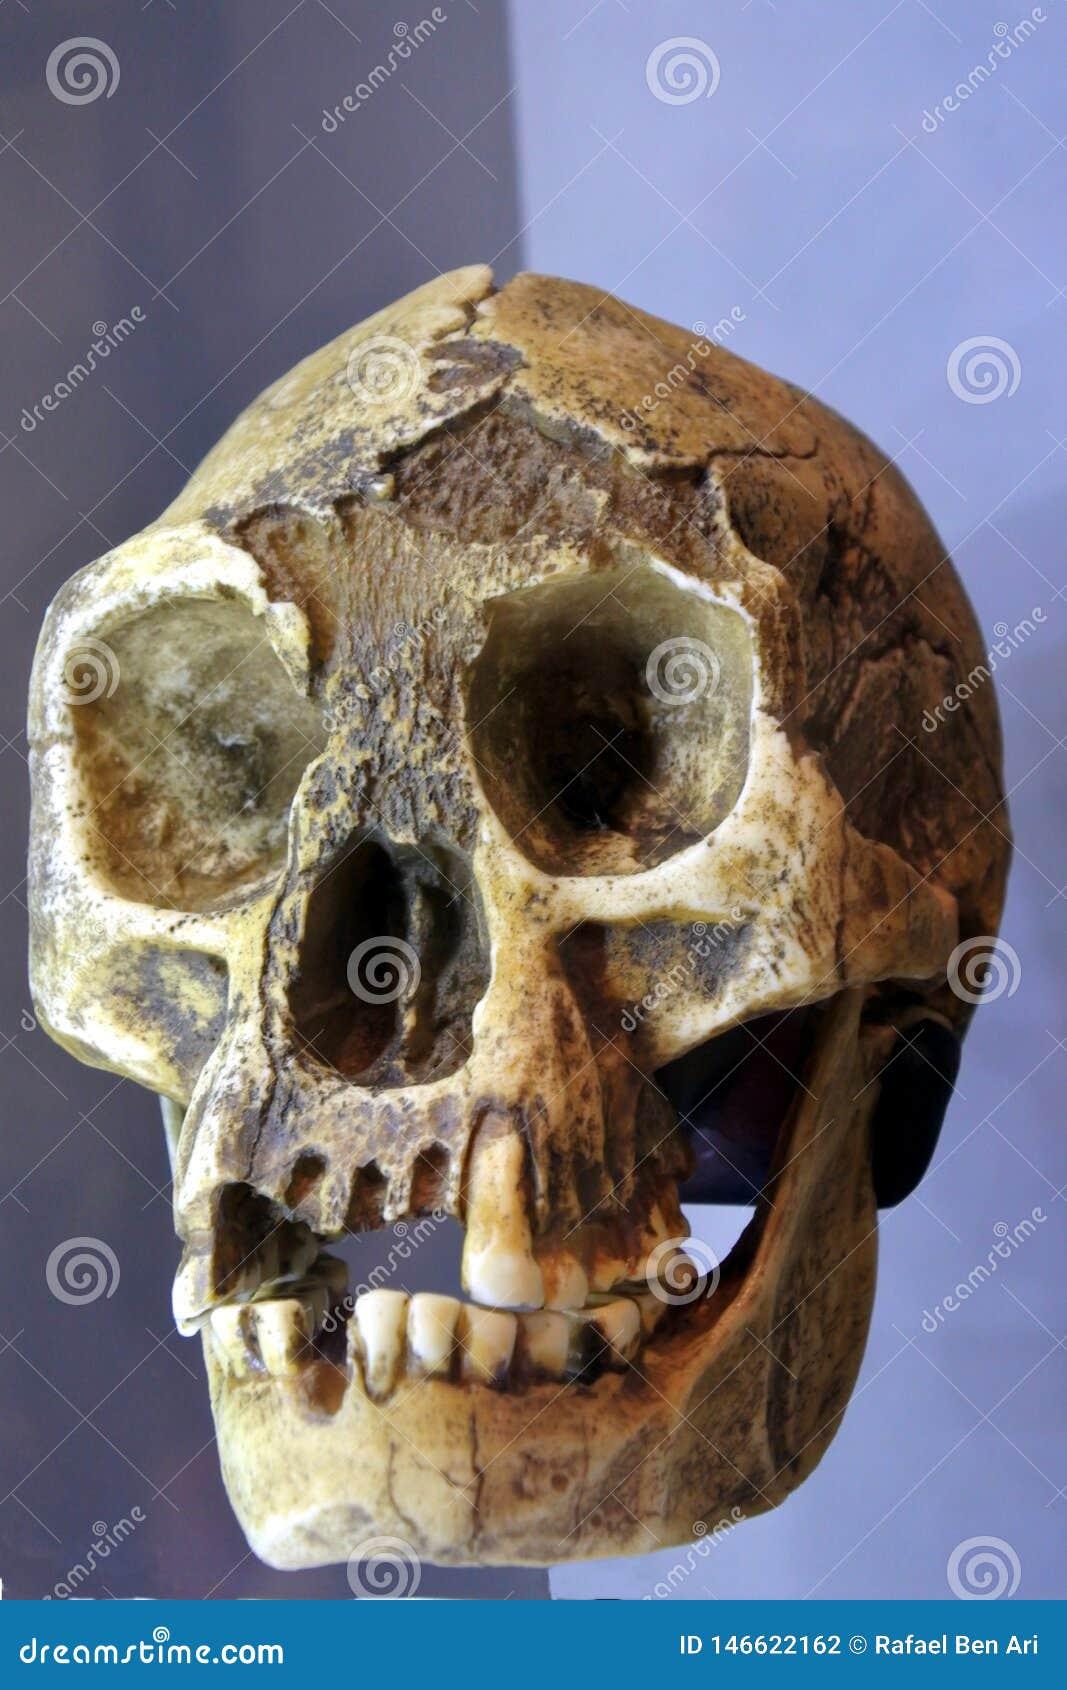 Vista delantera esquelética facial humana